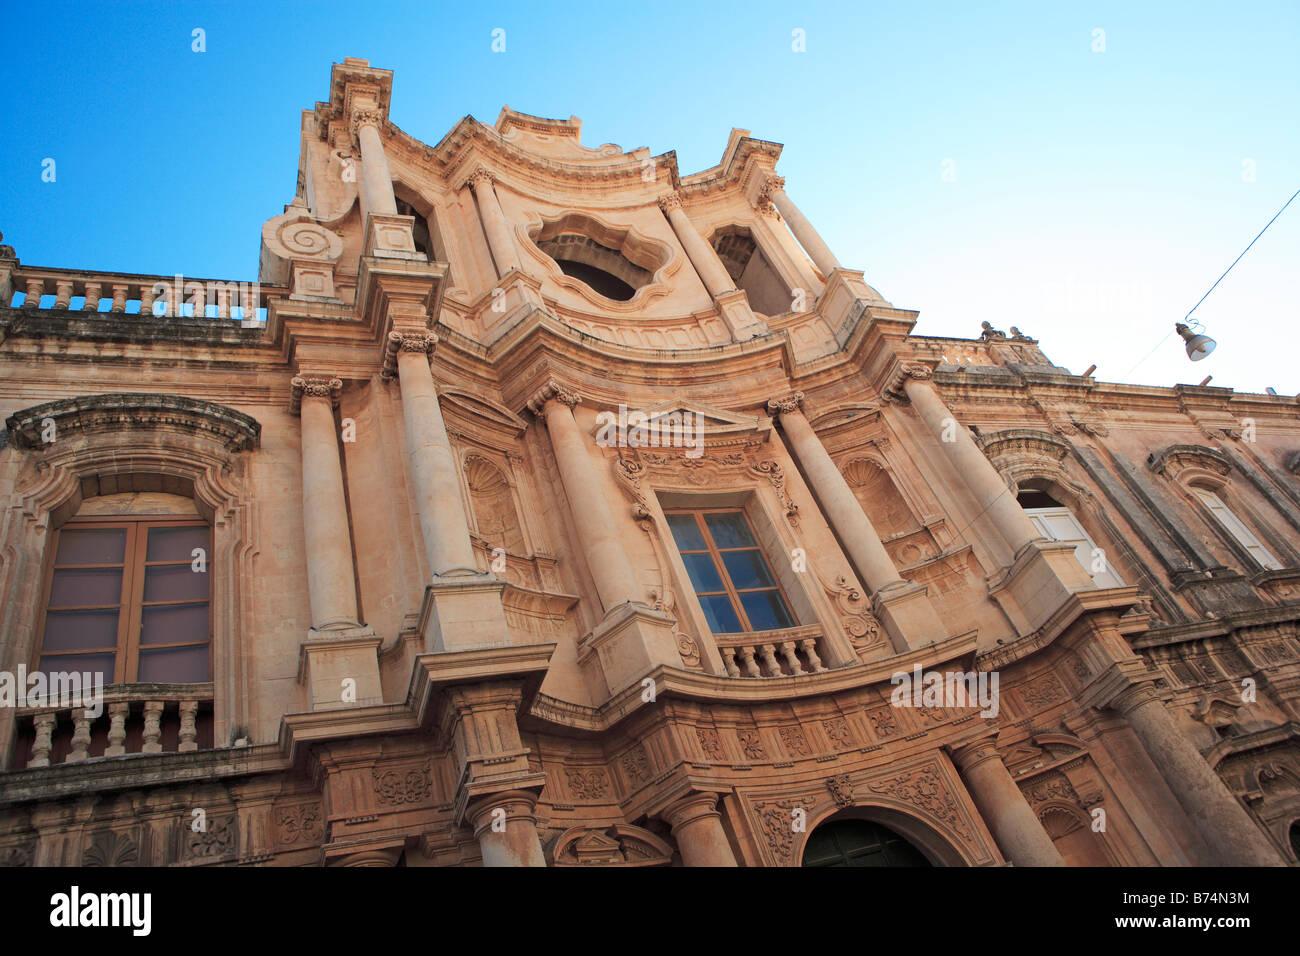 Jesuit Church of San Carlo, Noto, Sicily - Stock Image